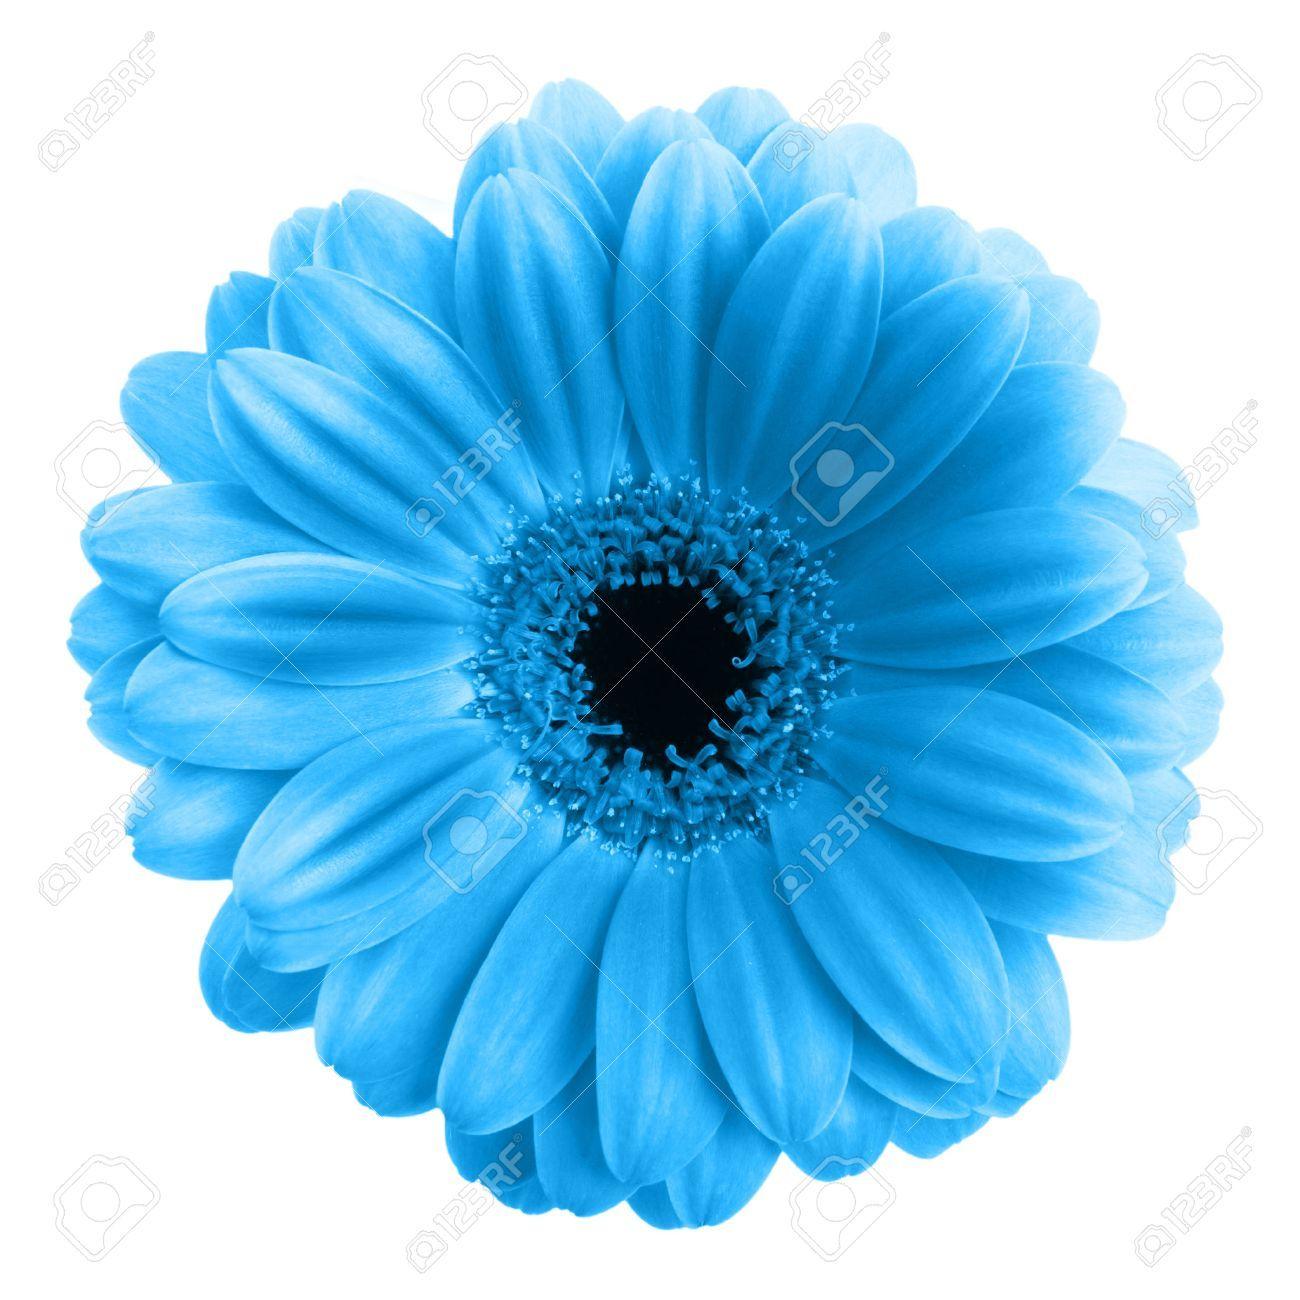 Blue Gerbera Flower Isolated On White Background Flower Graphic Gerbera Flower Flowers